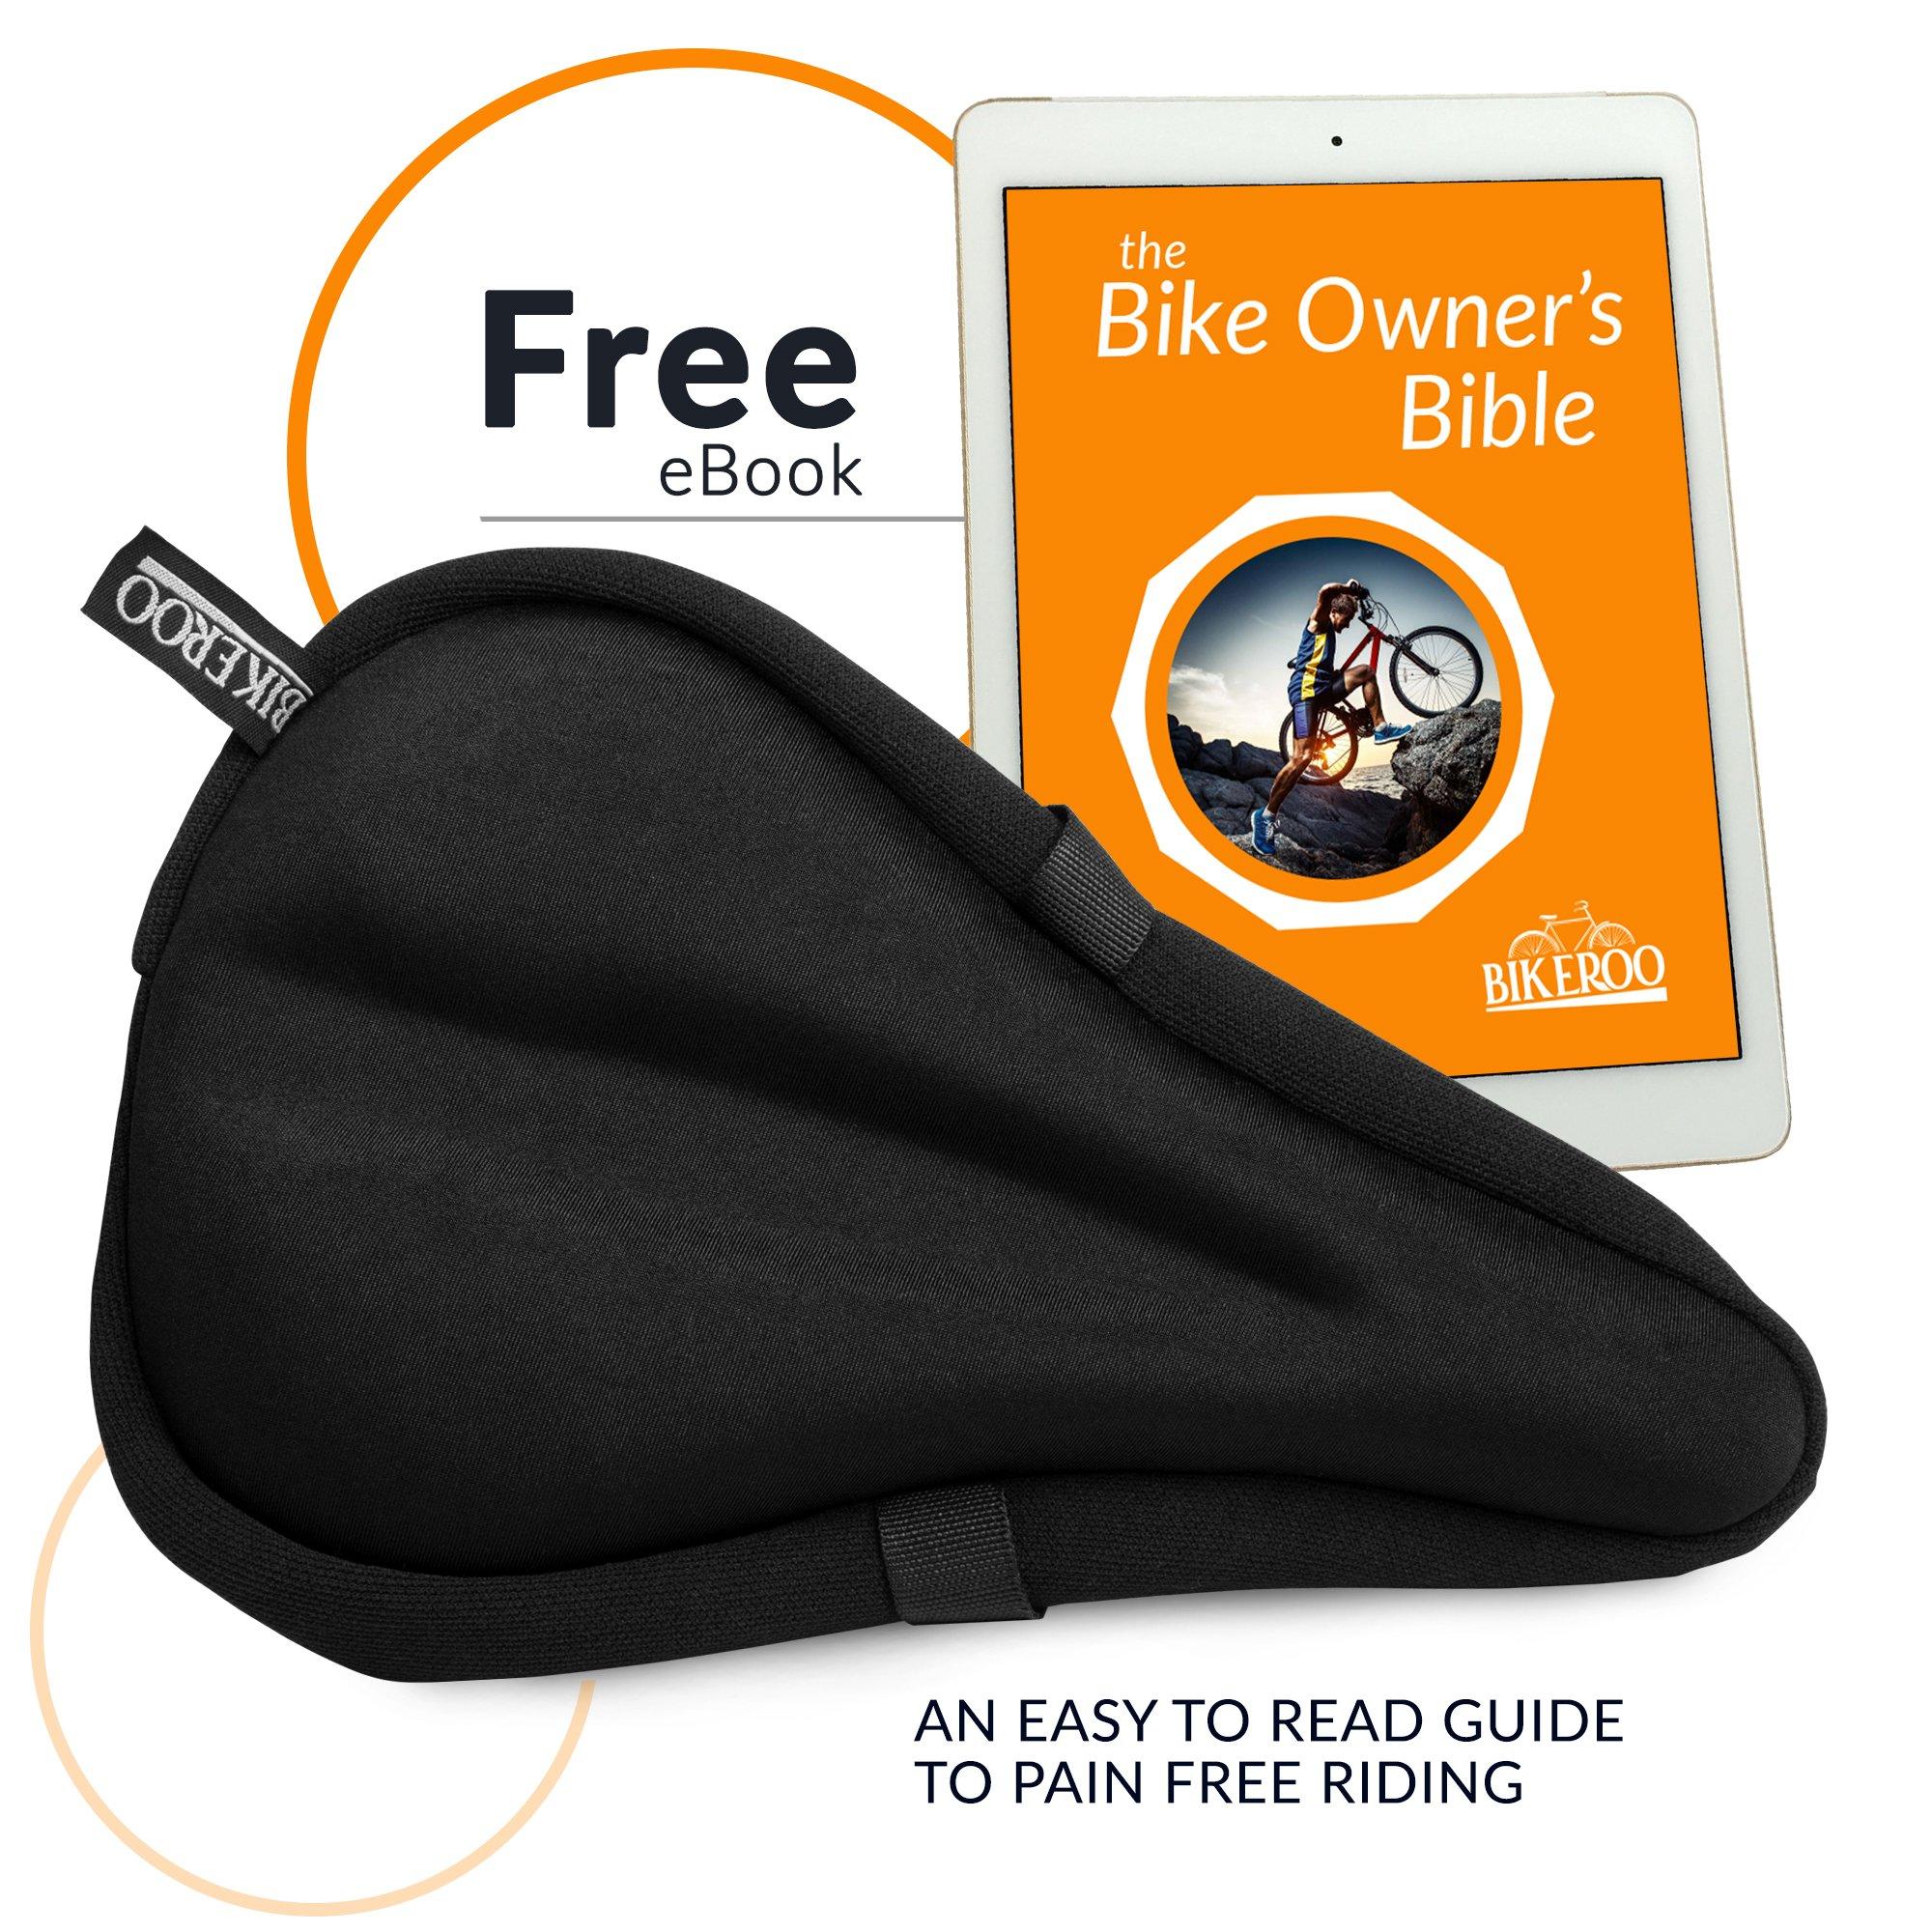 426e1949770 Bikeroo Most Comfortable Exercise Bike Seat Cushion – 28 x 18 CM ...